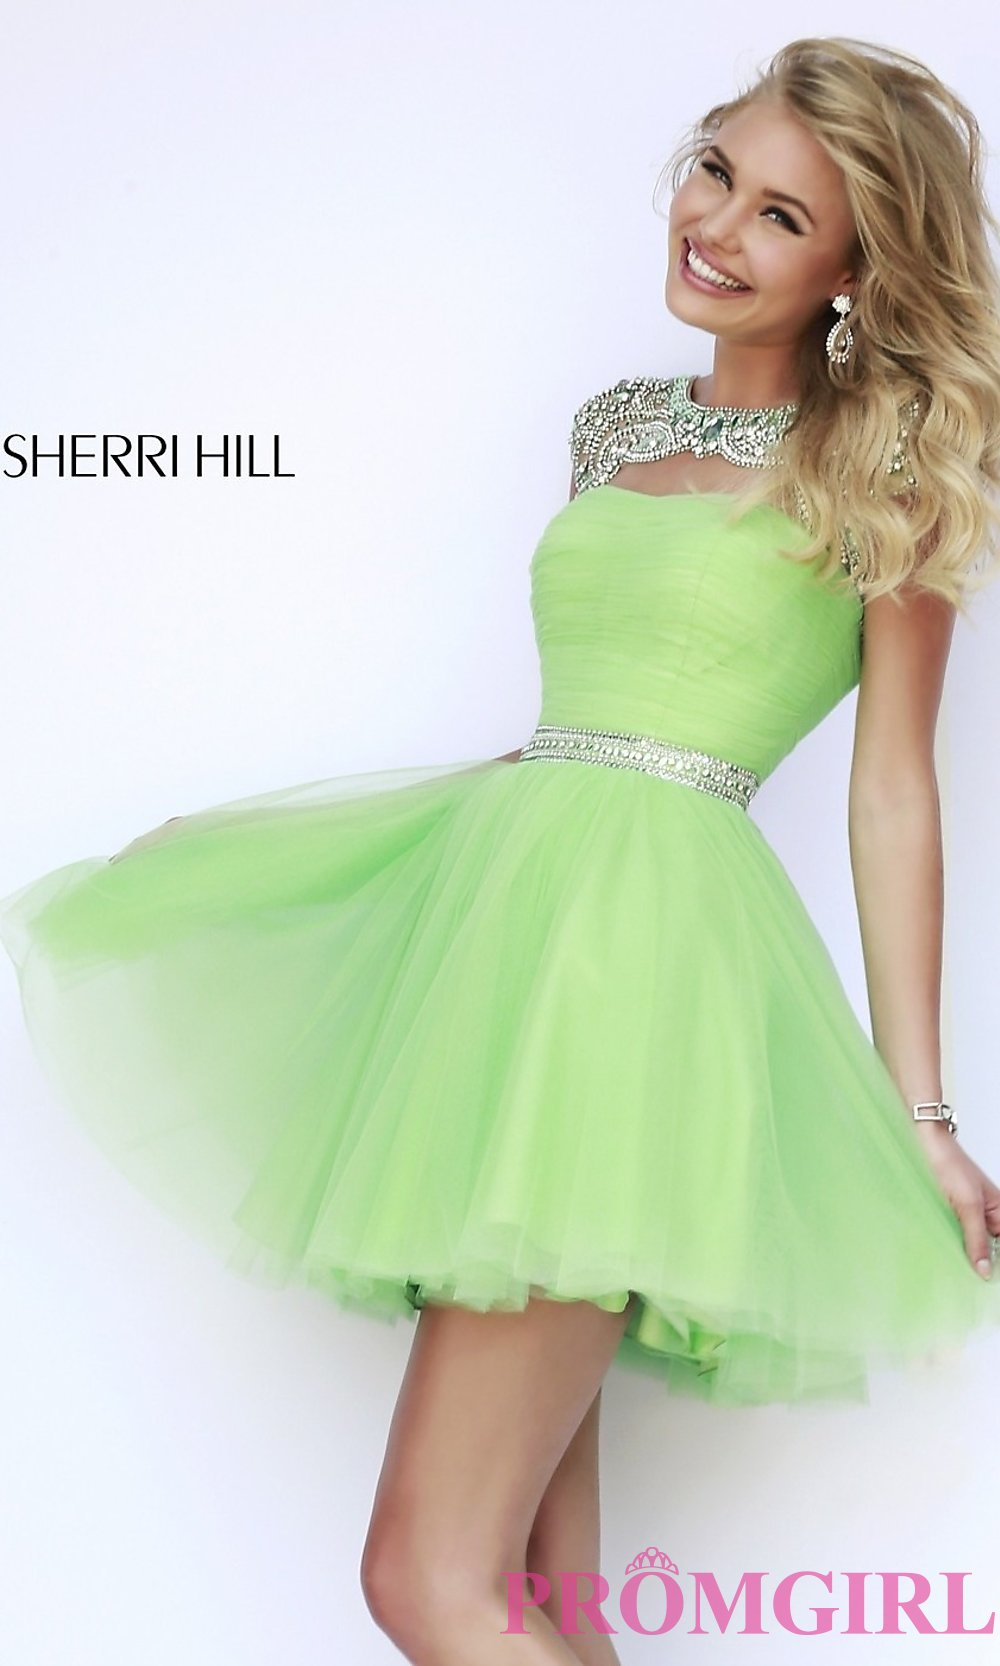 660ab55ede8d1 Short High Neck Sherri Hill Prom Dress